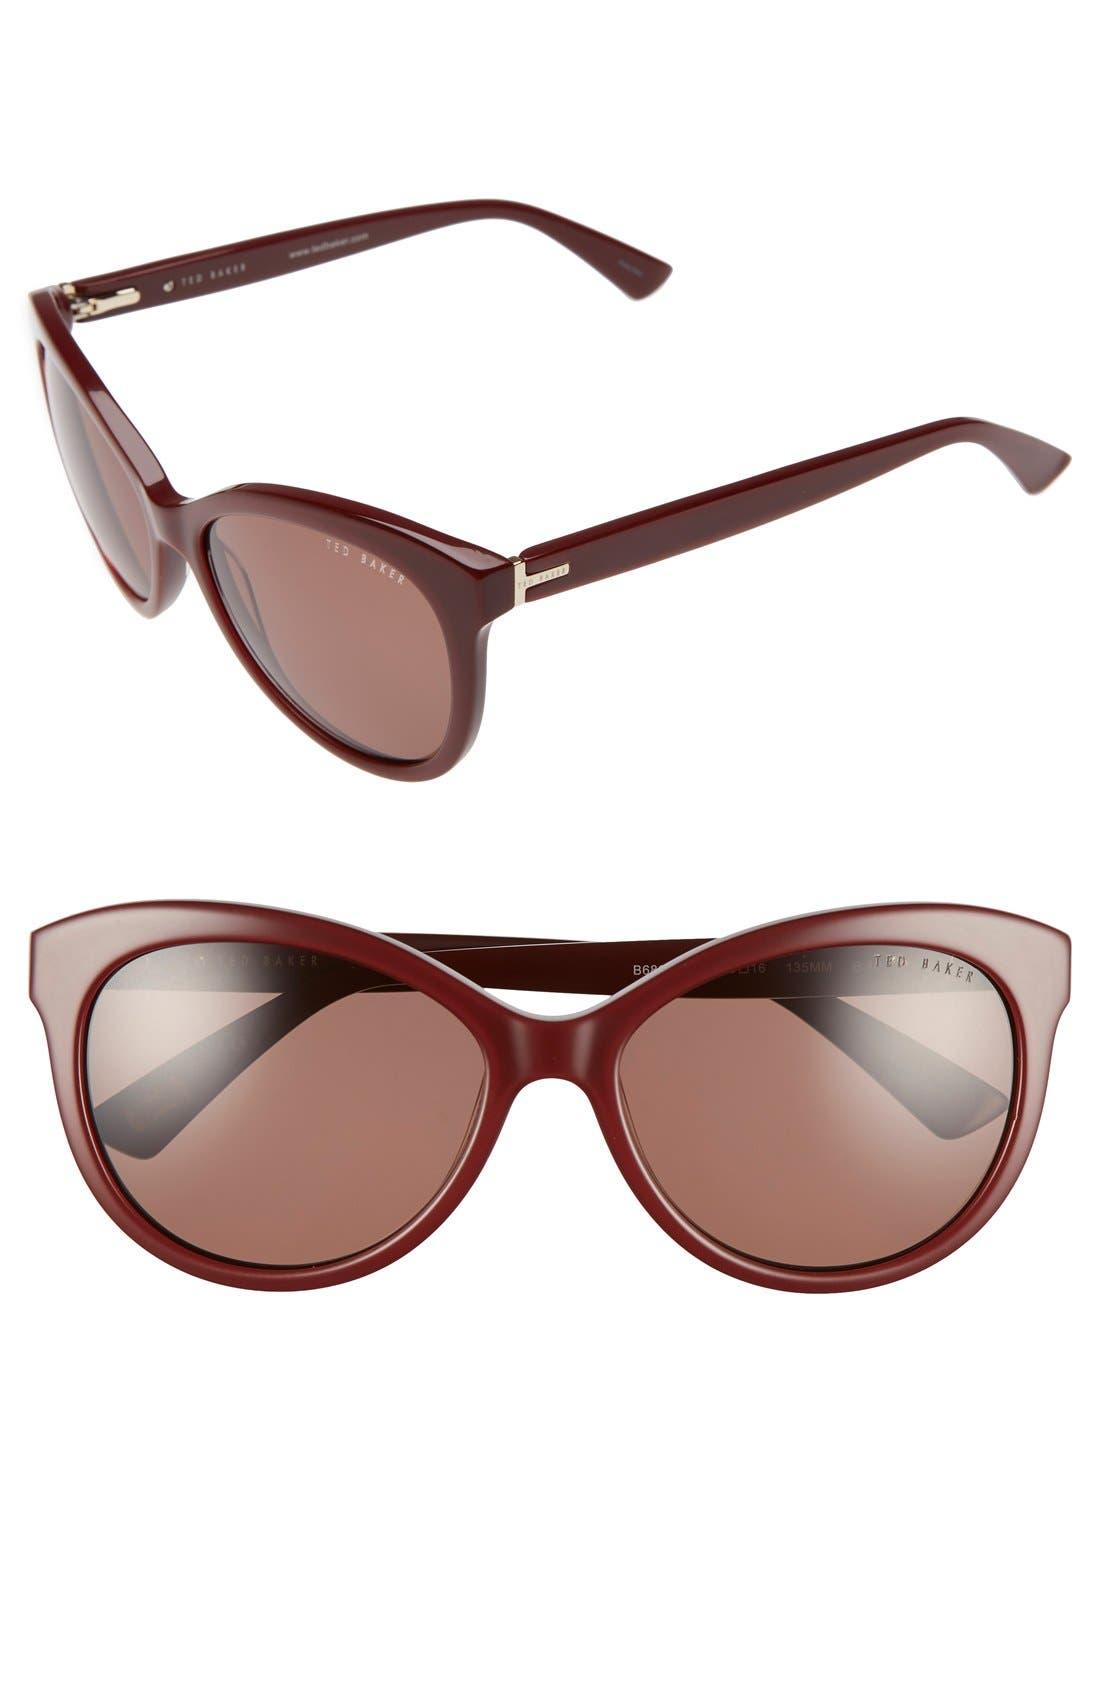 56mm Cat Eye Sunglasses,                             Main thumbnail 3, color,